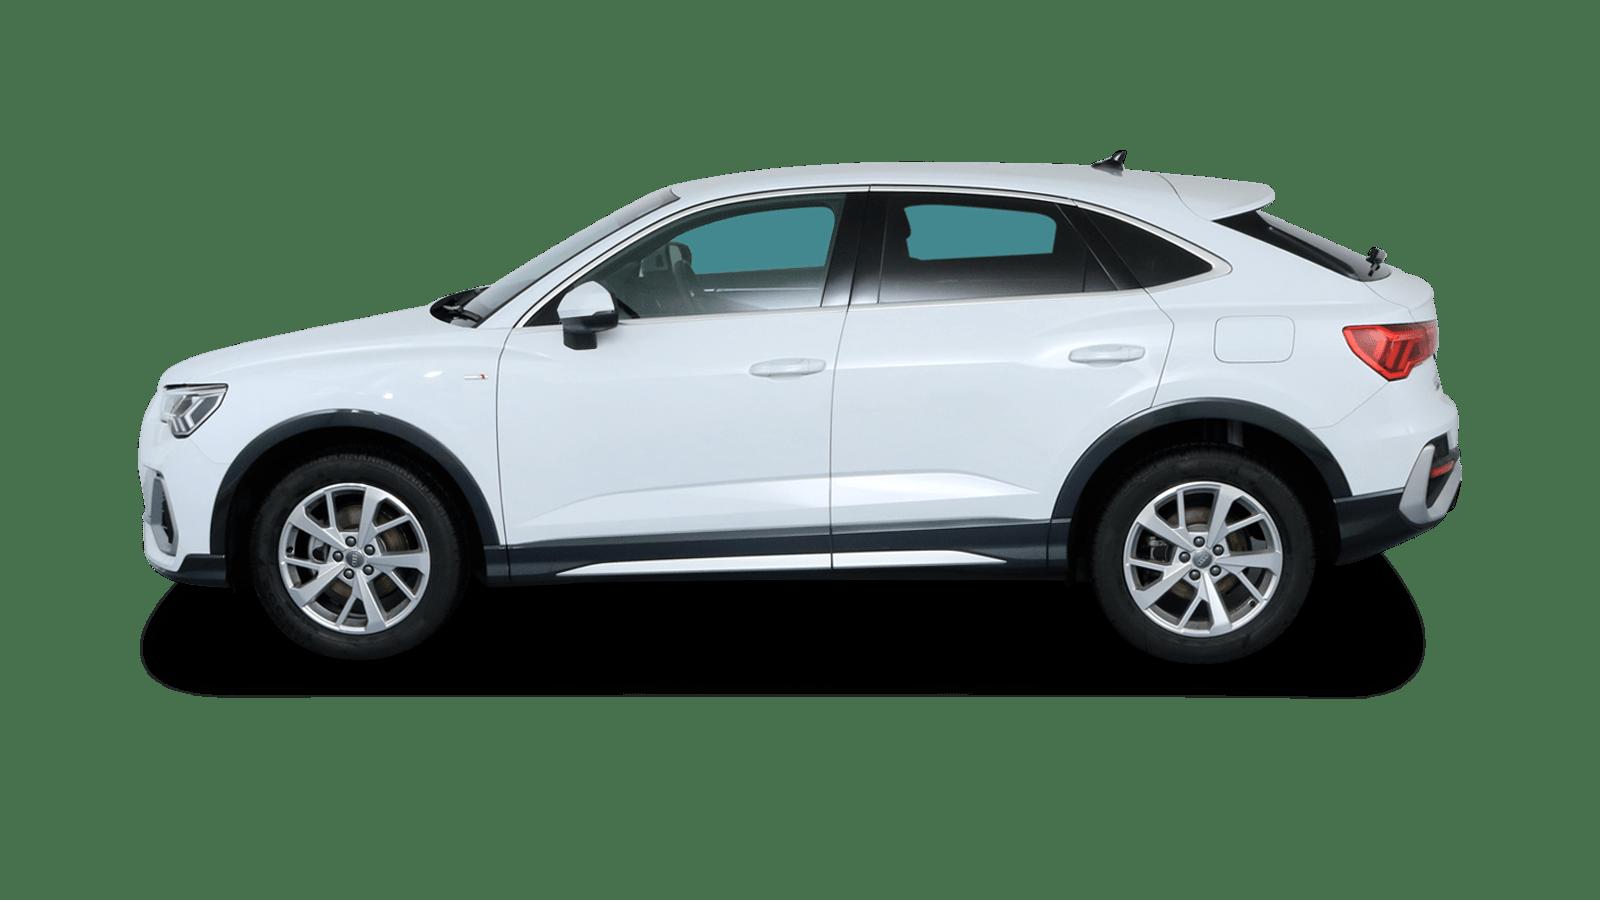 Audi Q3 Sportback White back - Clyde car subscription